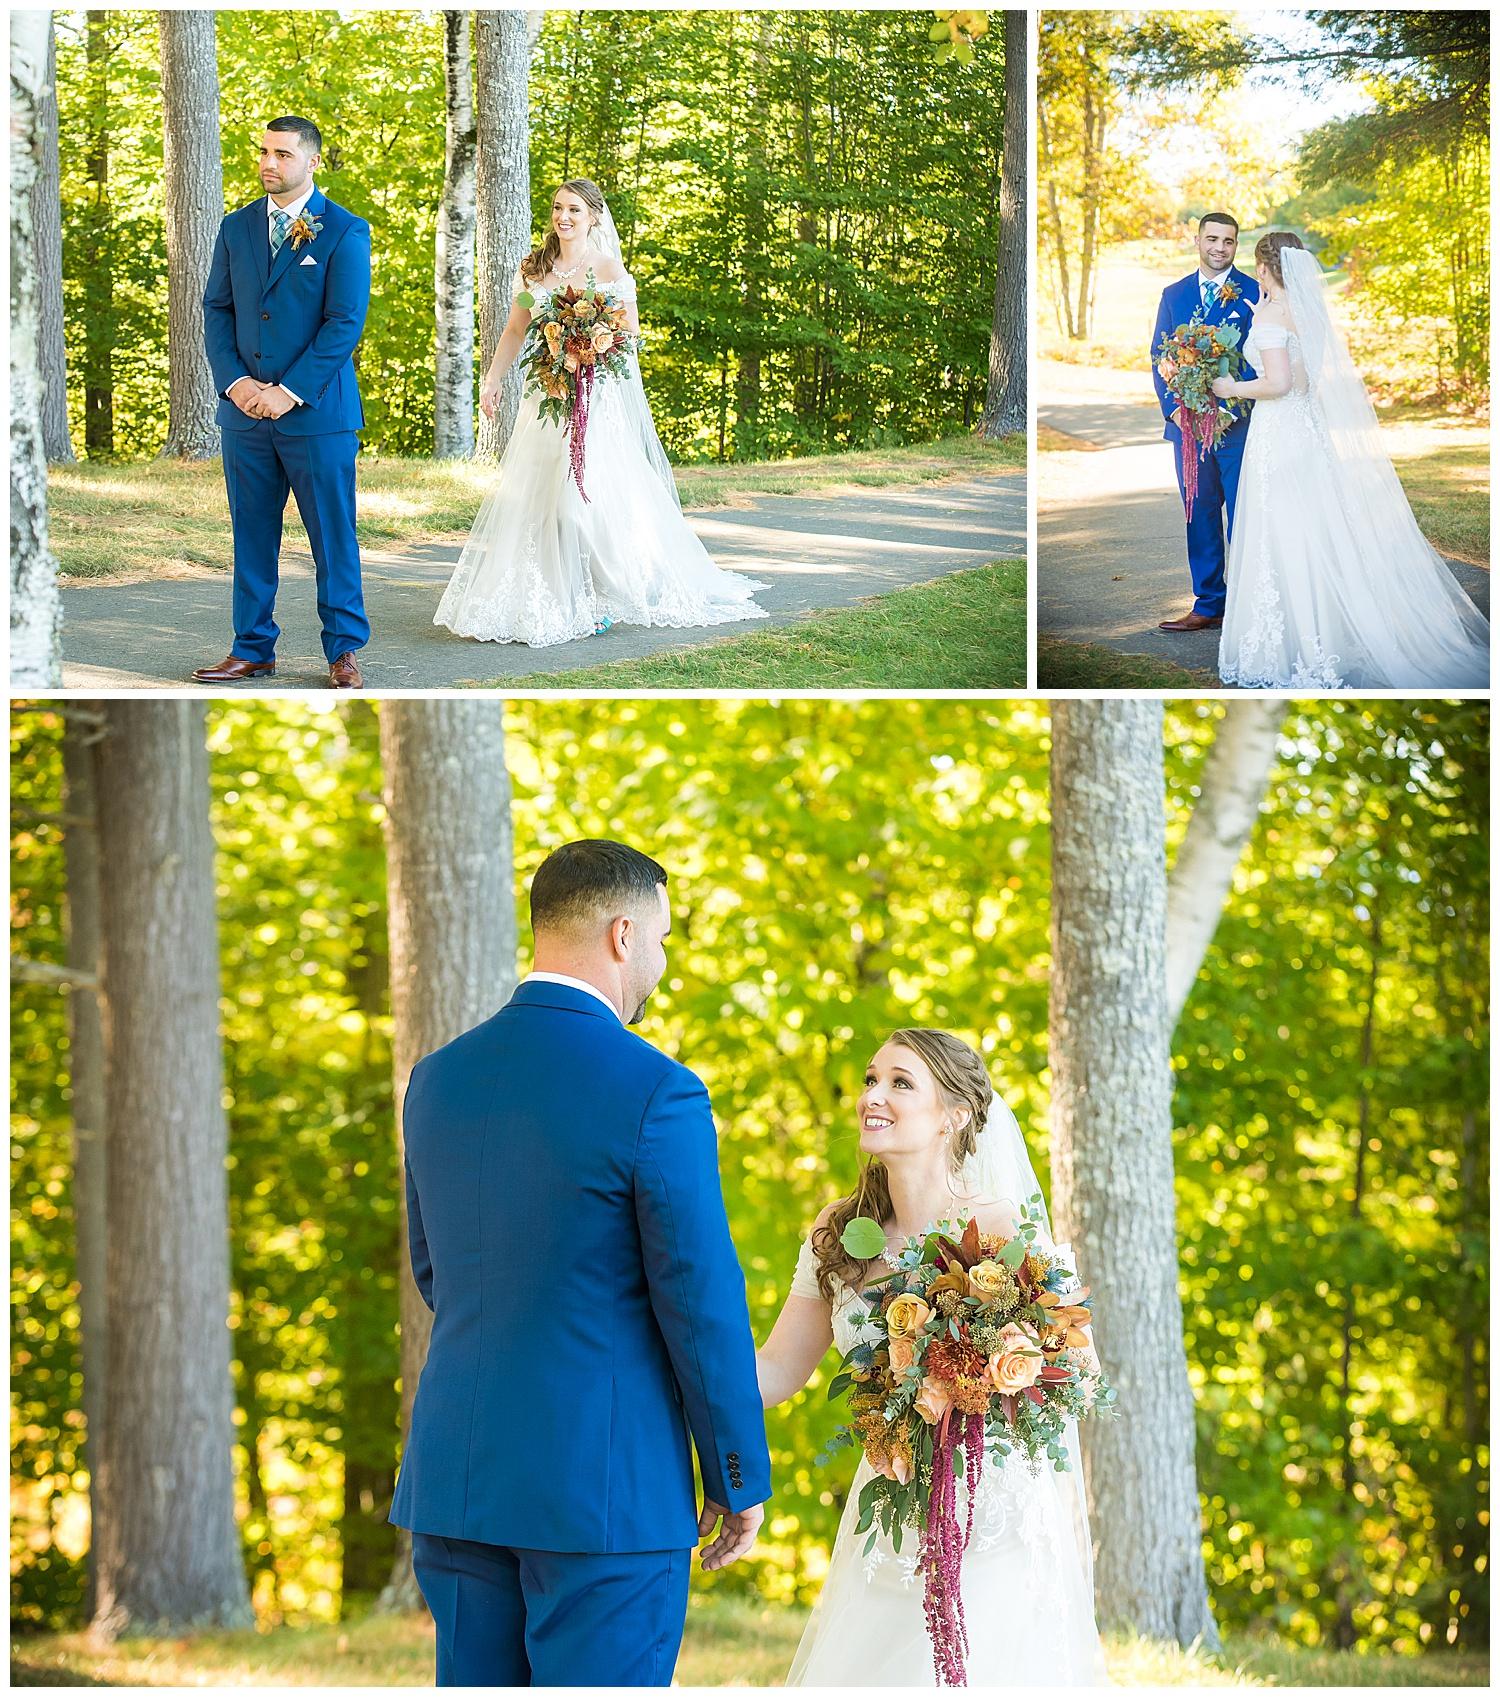 2Owl's Nest White Mountain Wedding - First Look